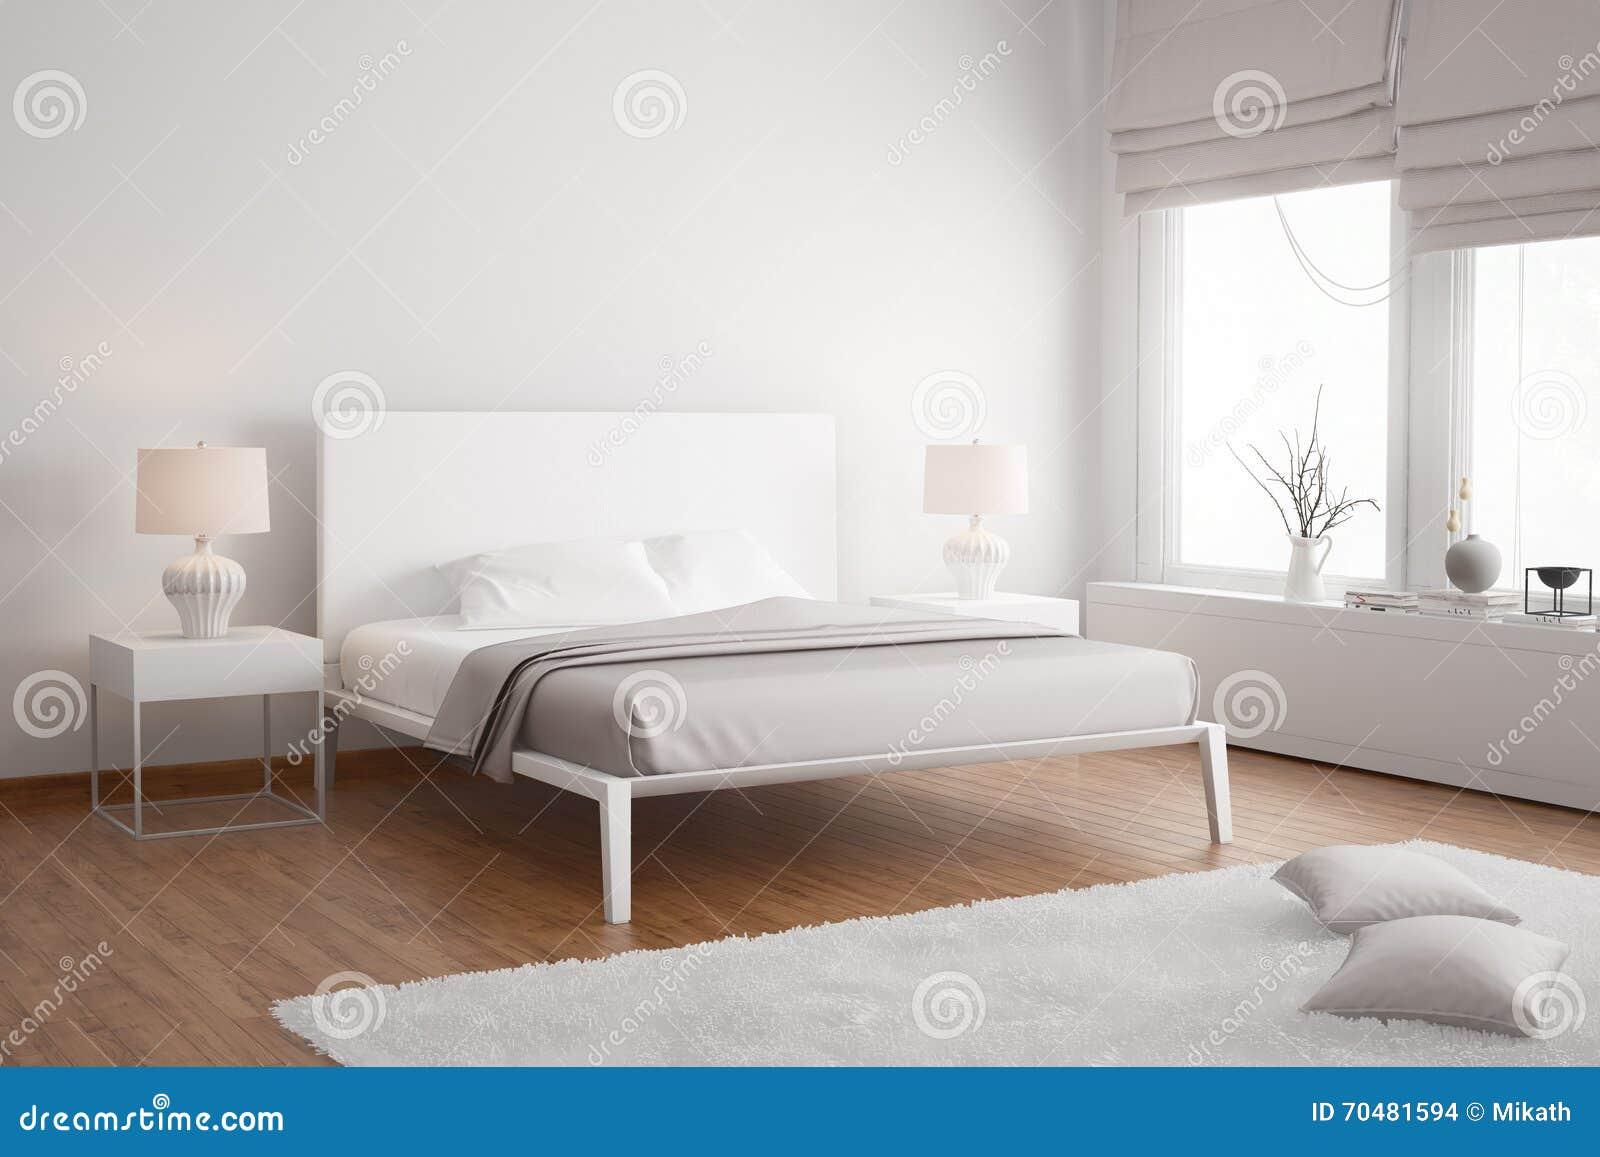 Chambre a coucher blanche et mauve for Chambre a coucher blanche moderne